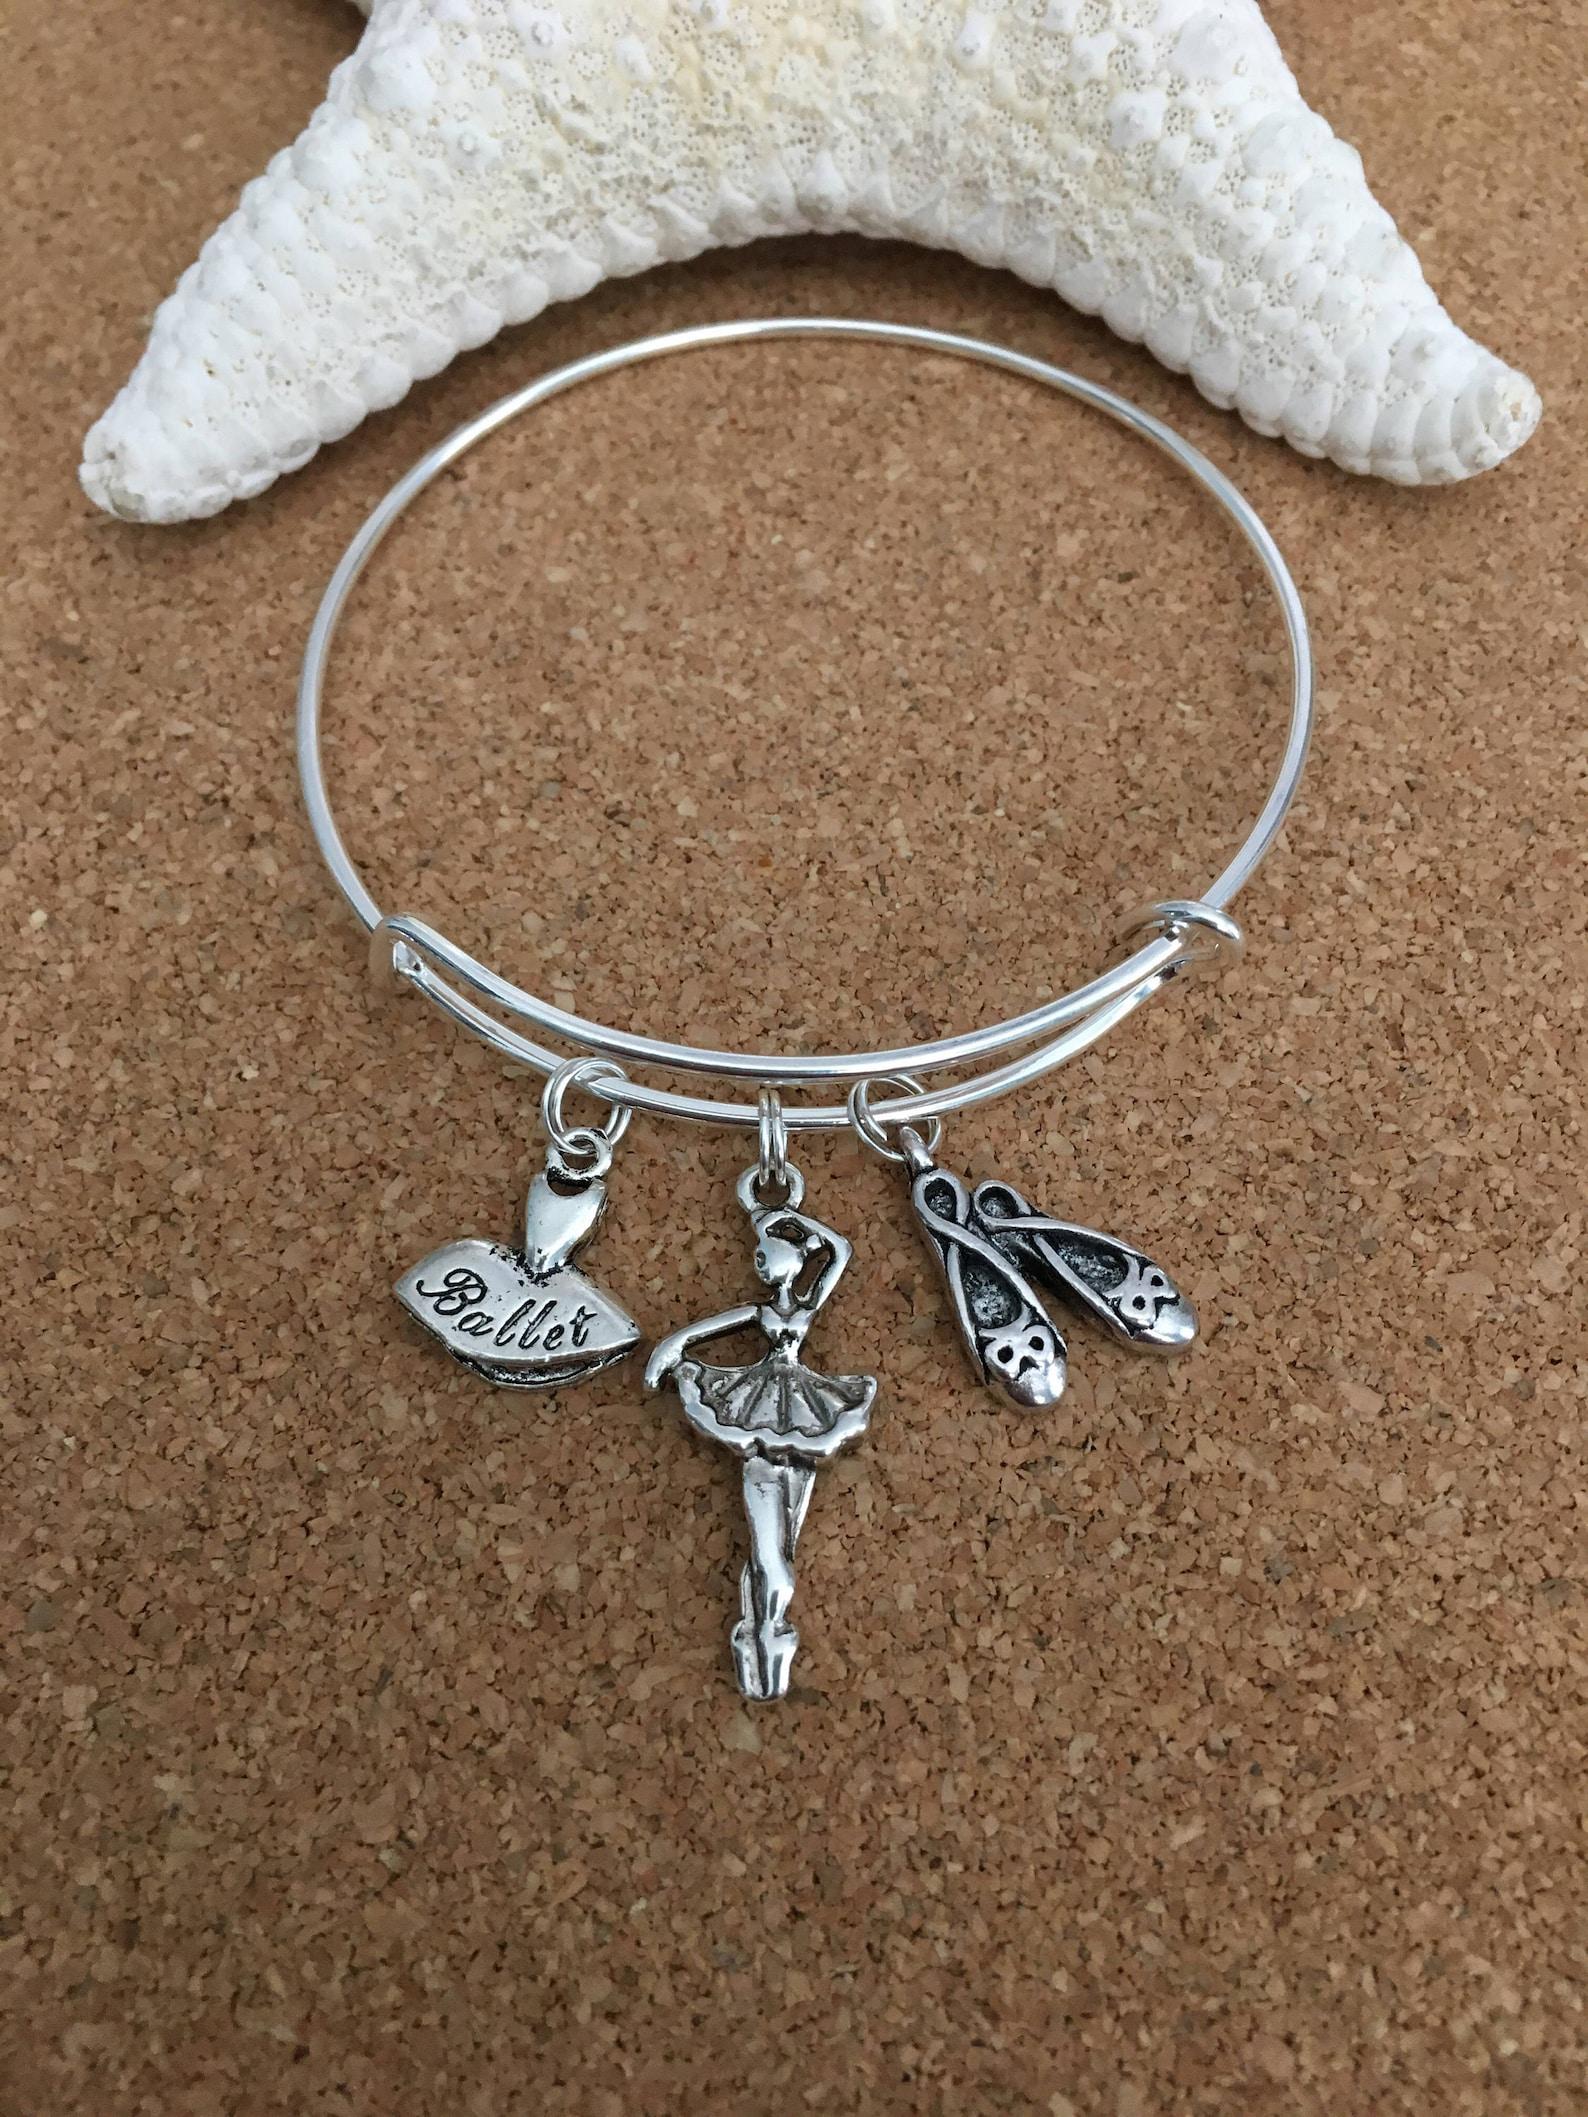 ballet charm bracelet, silver-plated bangle - ballet dress charm, ballerina charm, ballet shoes charm, choose girls or ladies, d